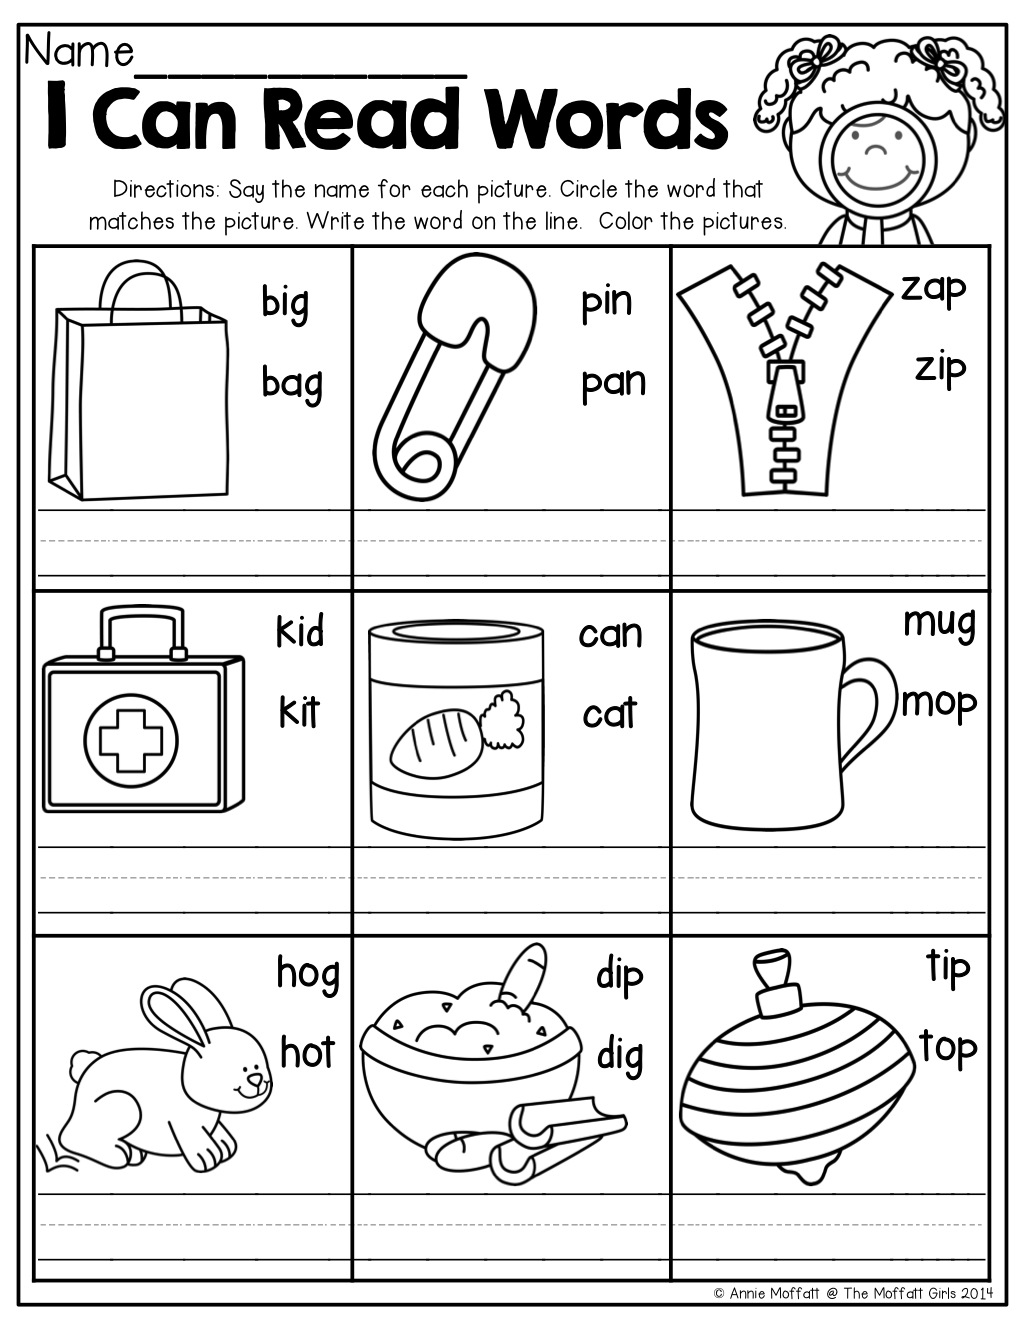 medium resolution of The Moffatt Girls: St. Patrick's Day NO PREP Packets!   Phonics kindergarten